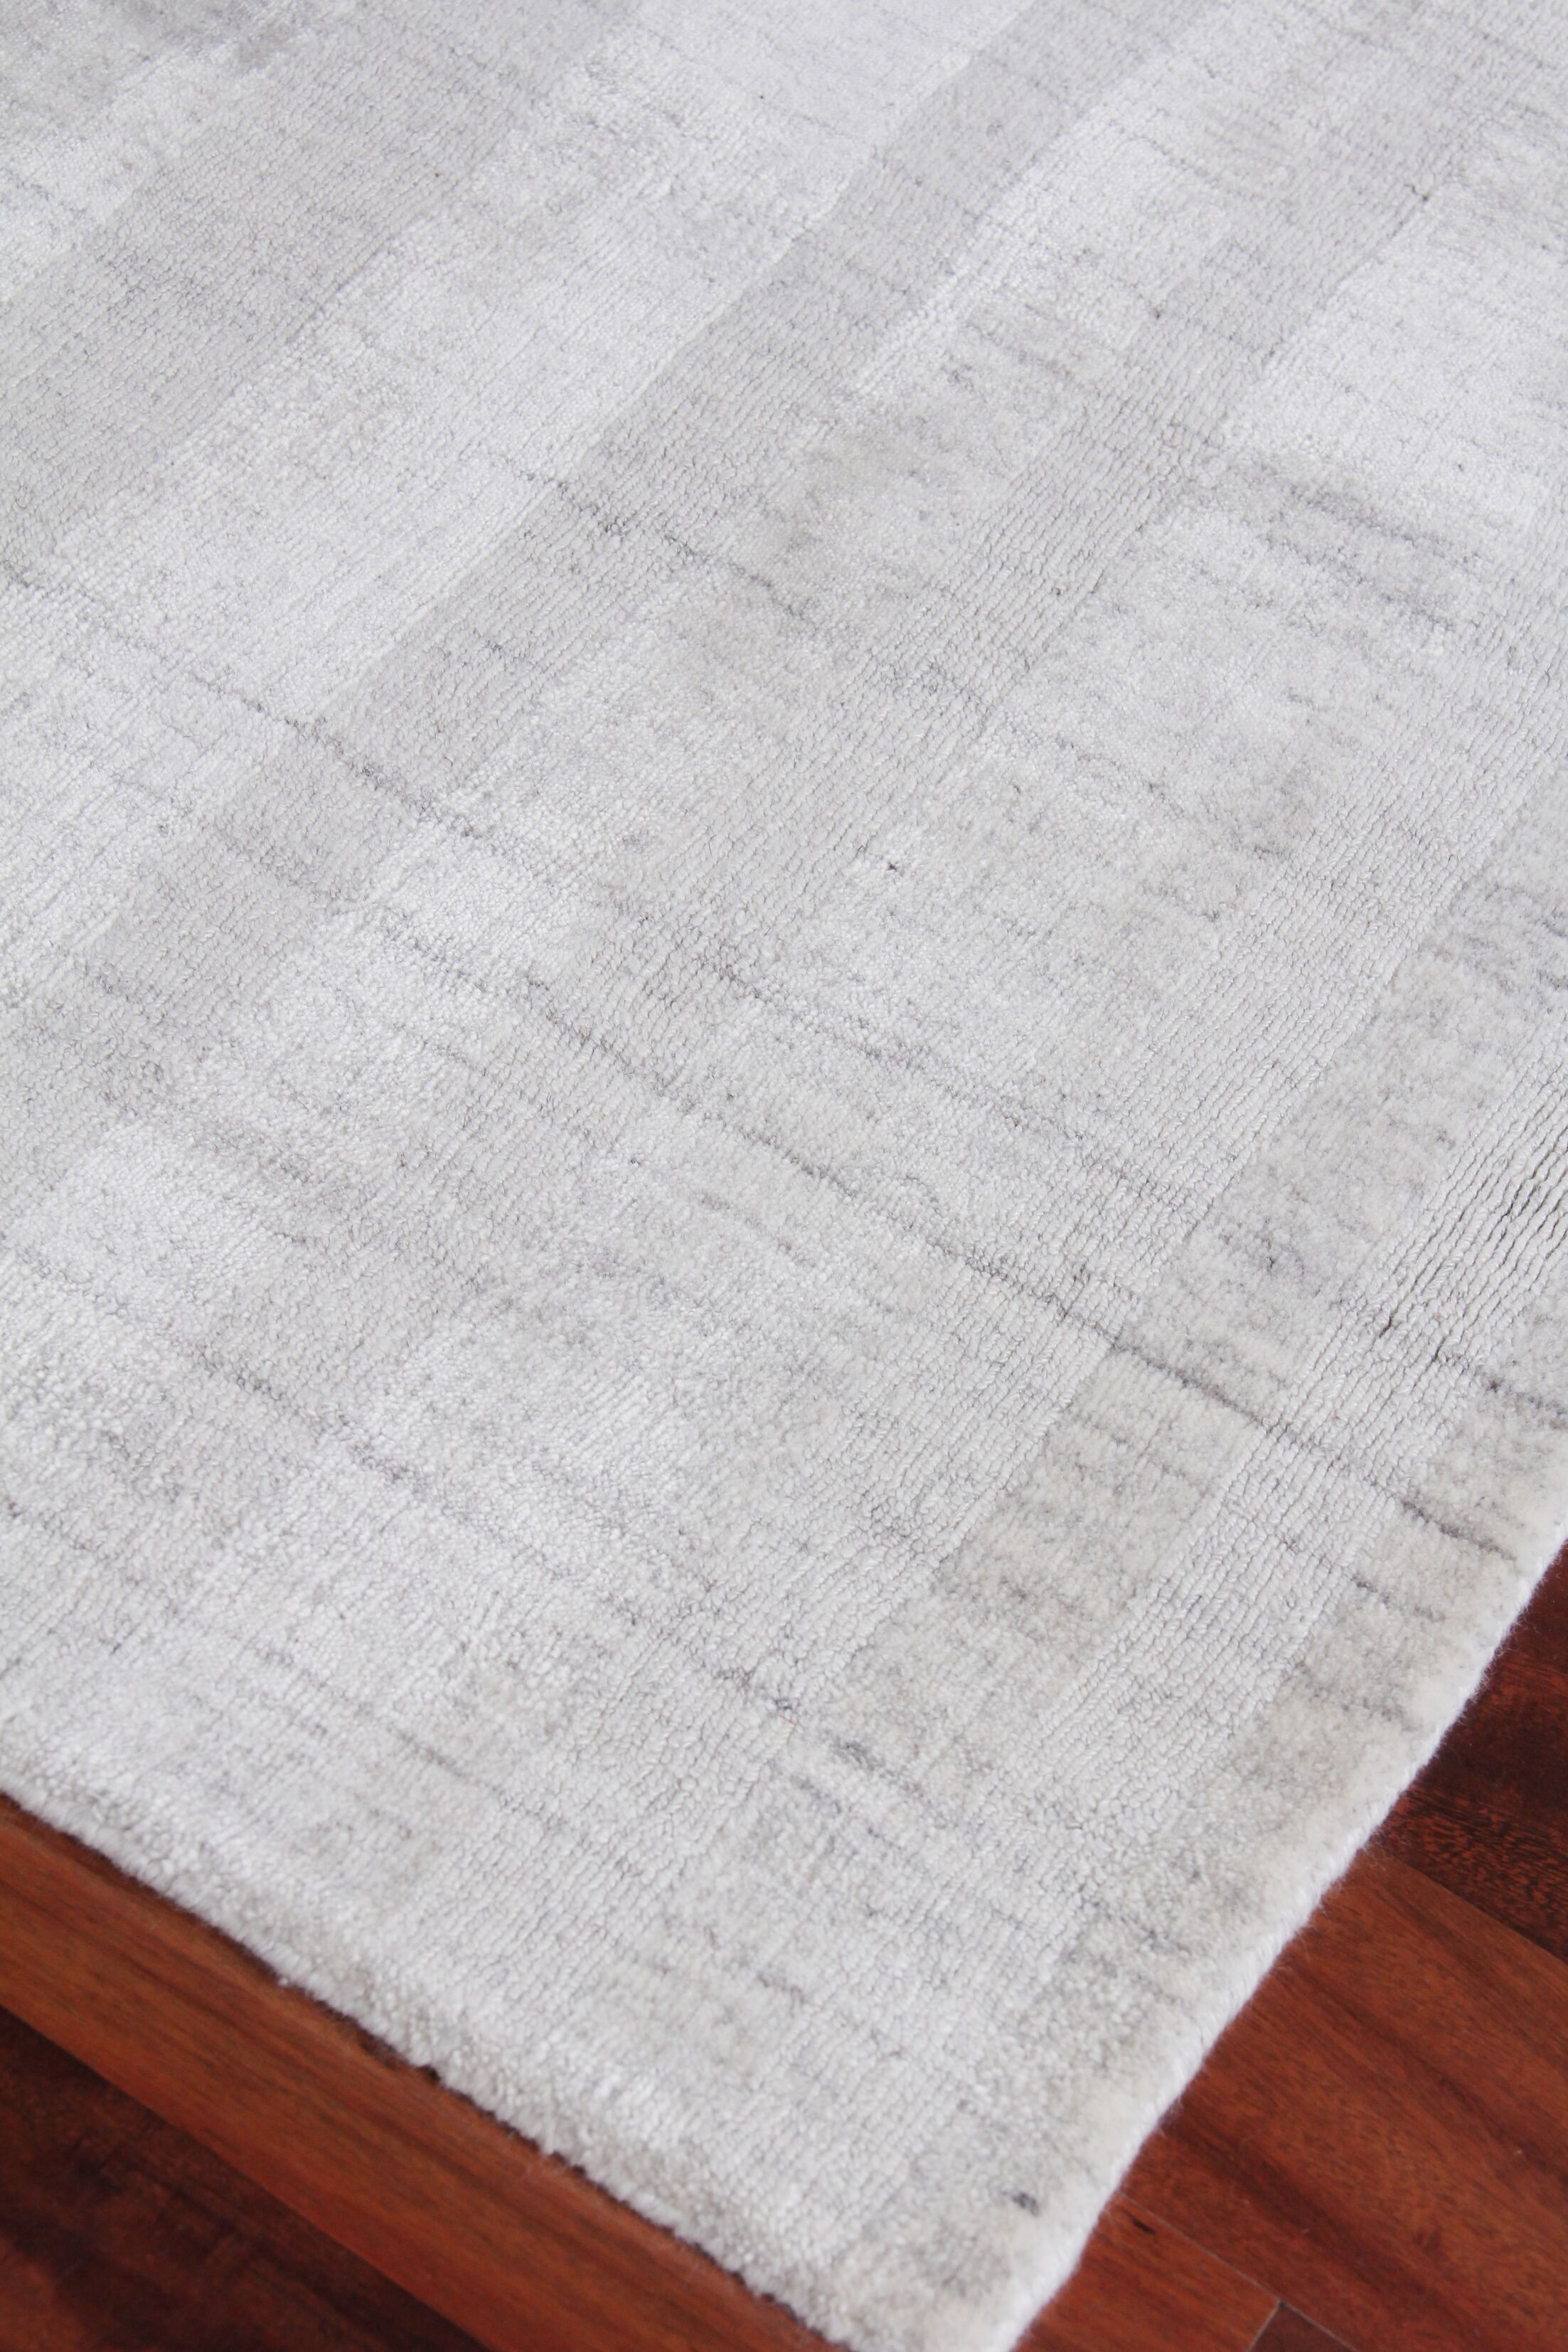 Robin Hand-Woven Silver Area Rug Rug Size: Rectangle 10' x 14'